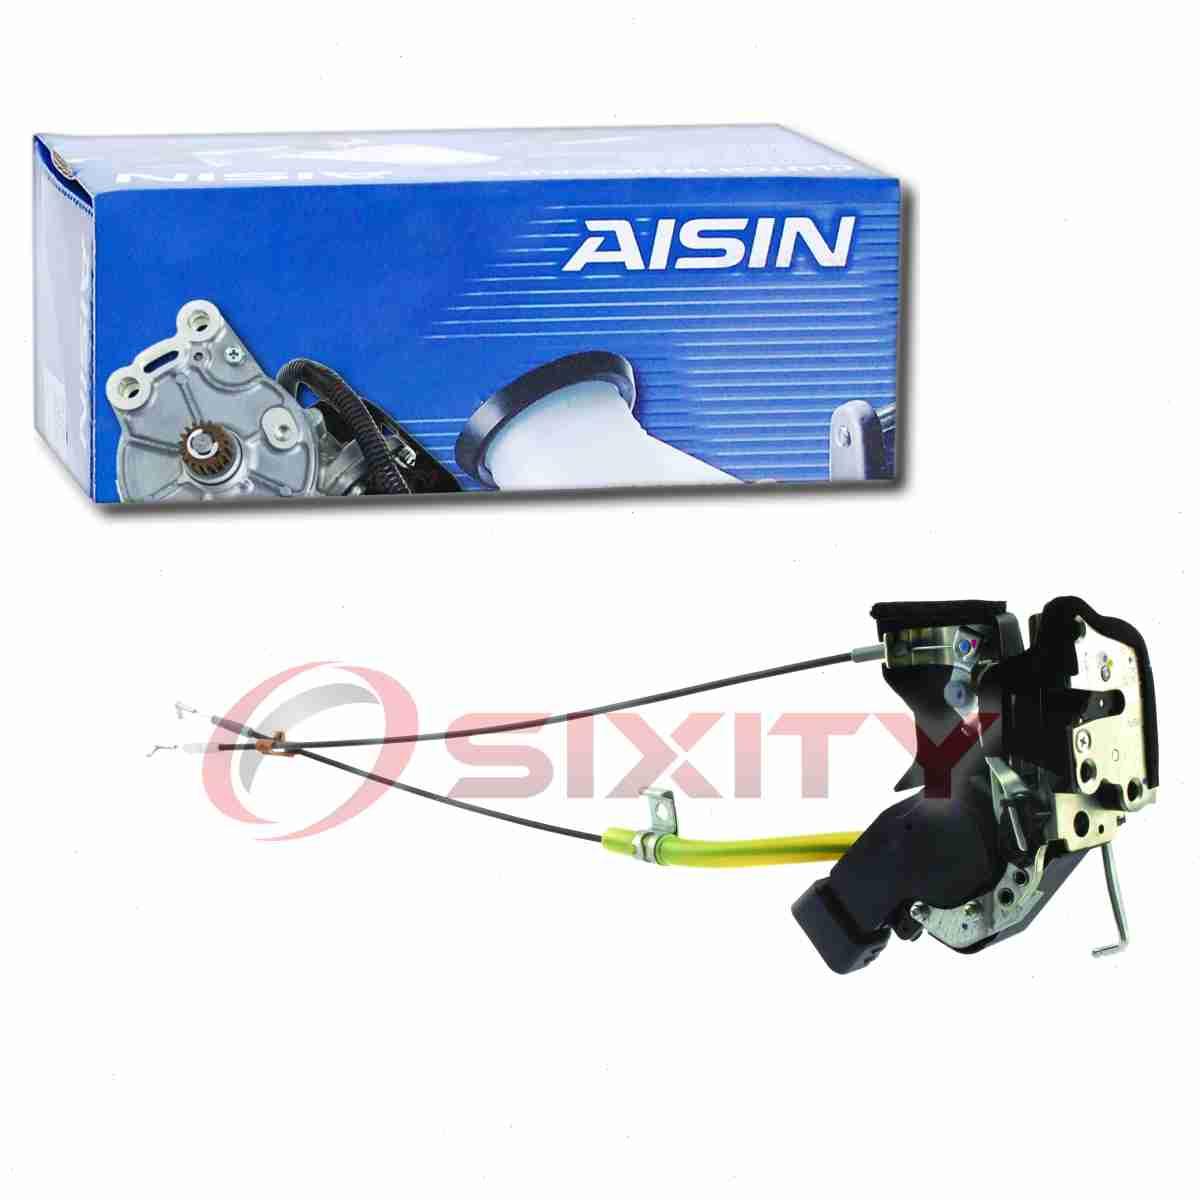 AISIN Rear Right Door Lock Actuator Motor for 1998-2007 Toyota Land Cruiser ey